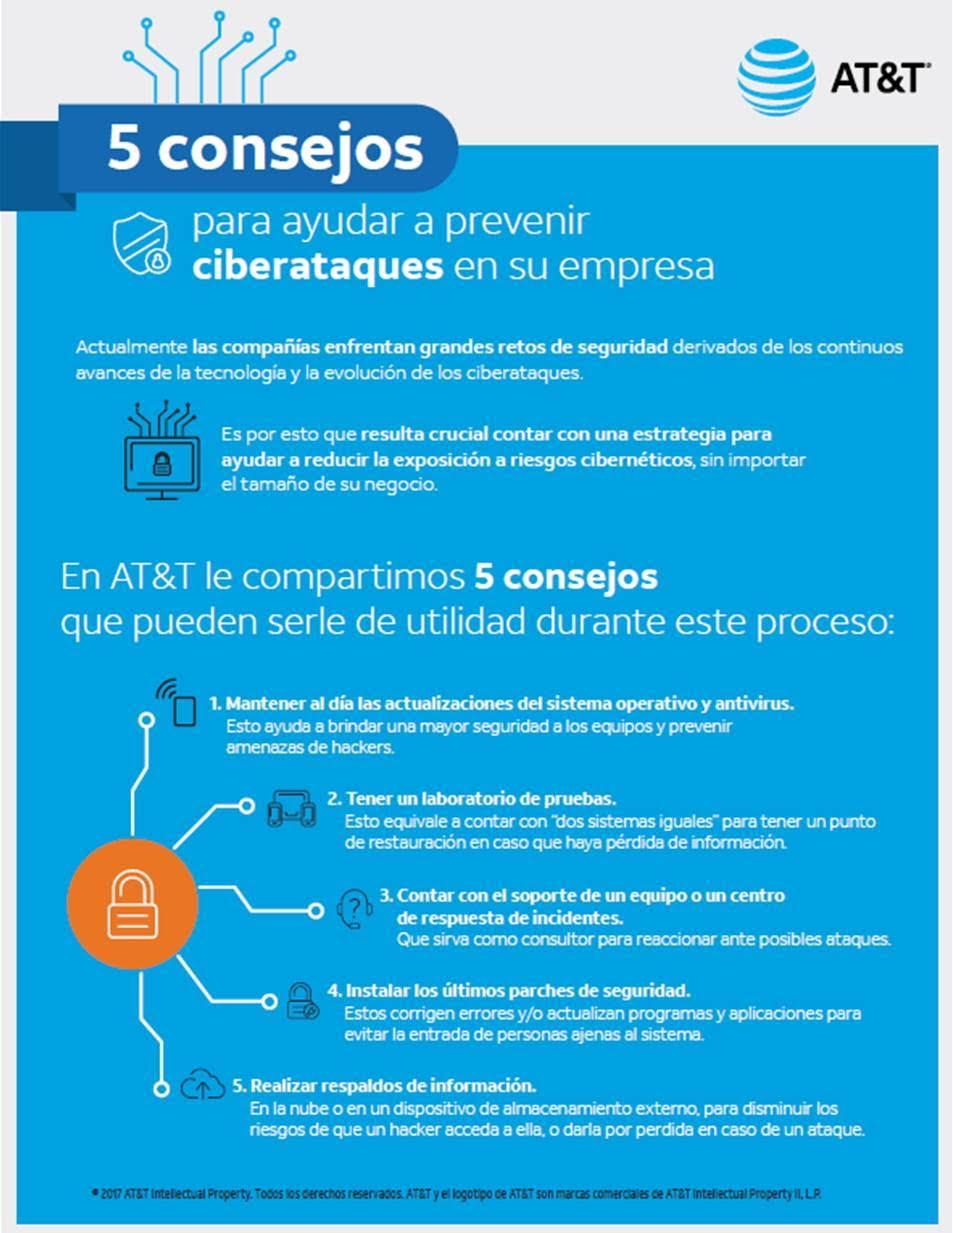 5 consejos para ayudar a prevenir ciberataques en su empresa